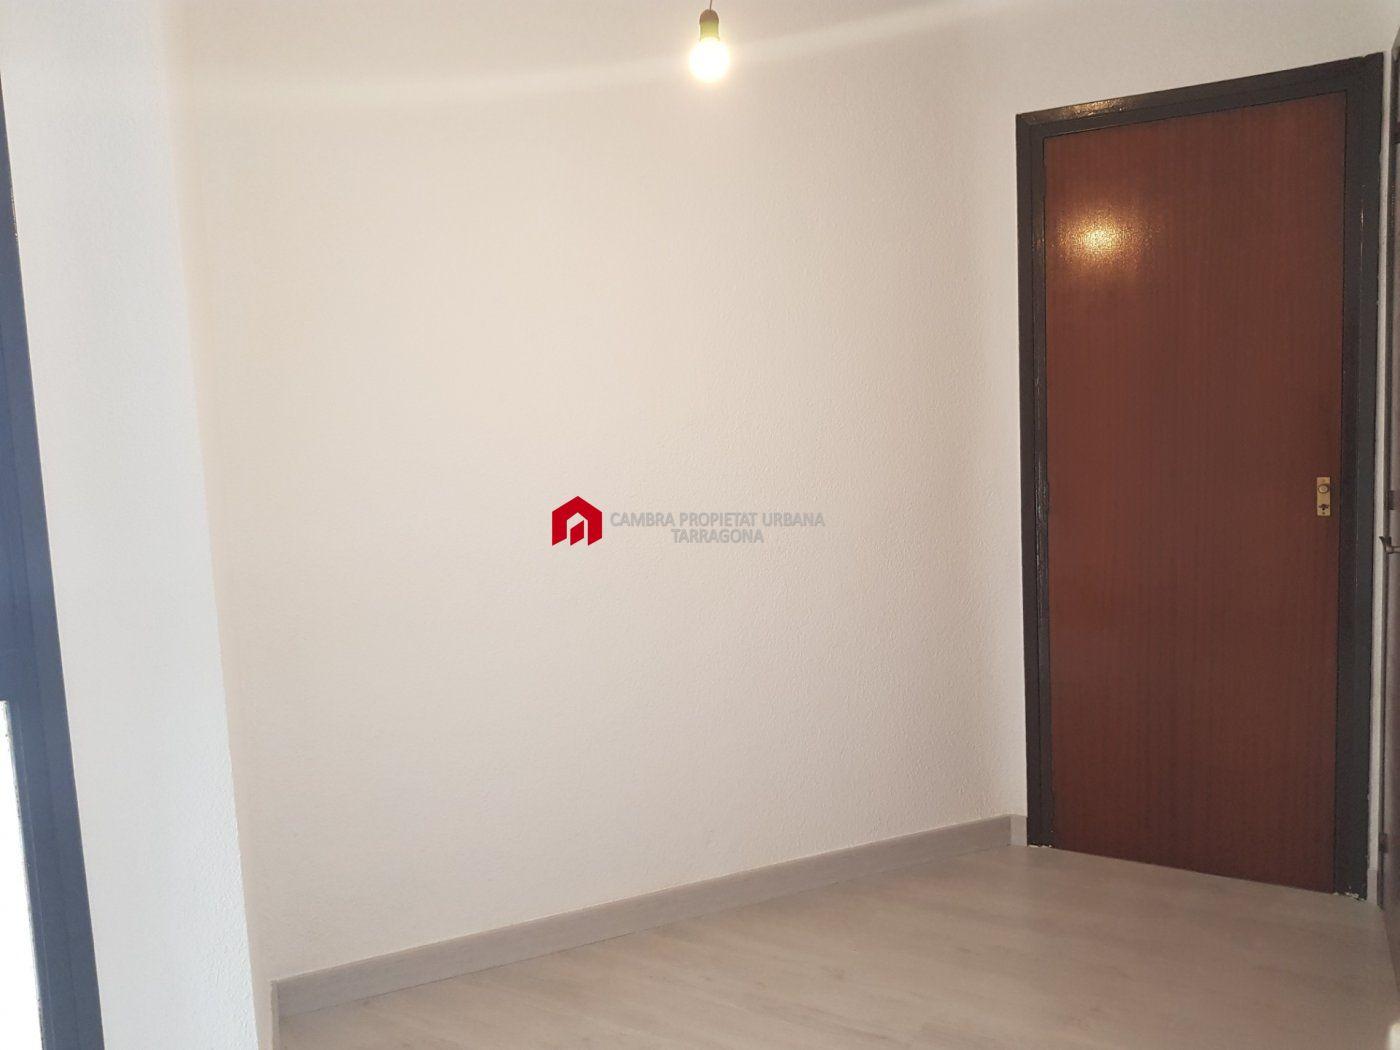 Pis · Tarragona · Centro 740€ MES€